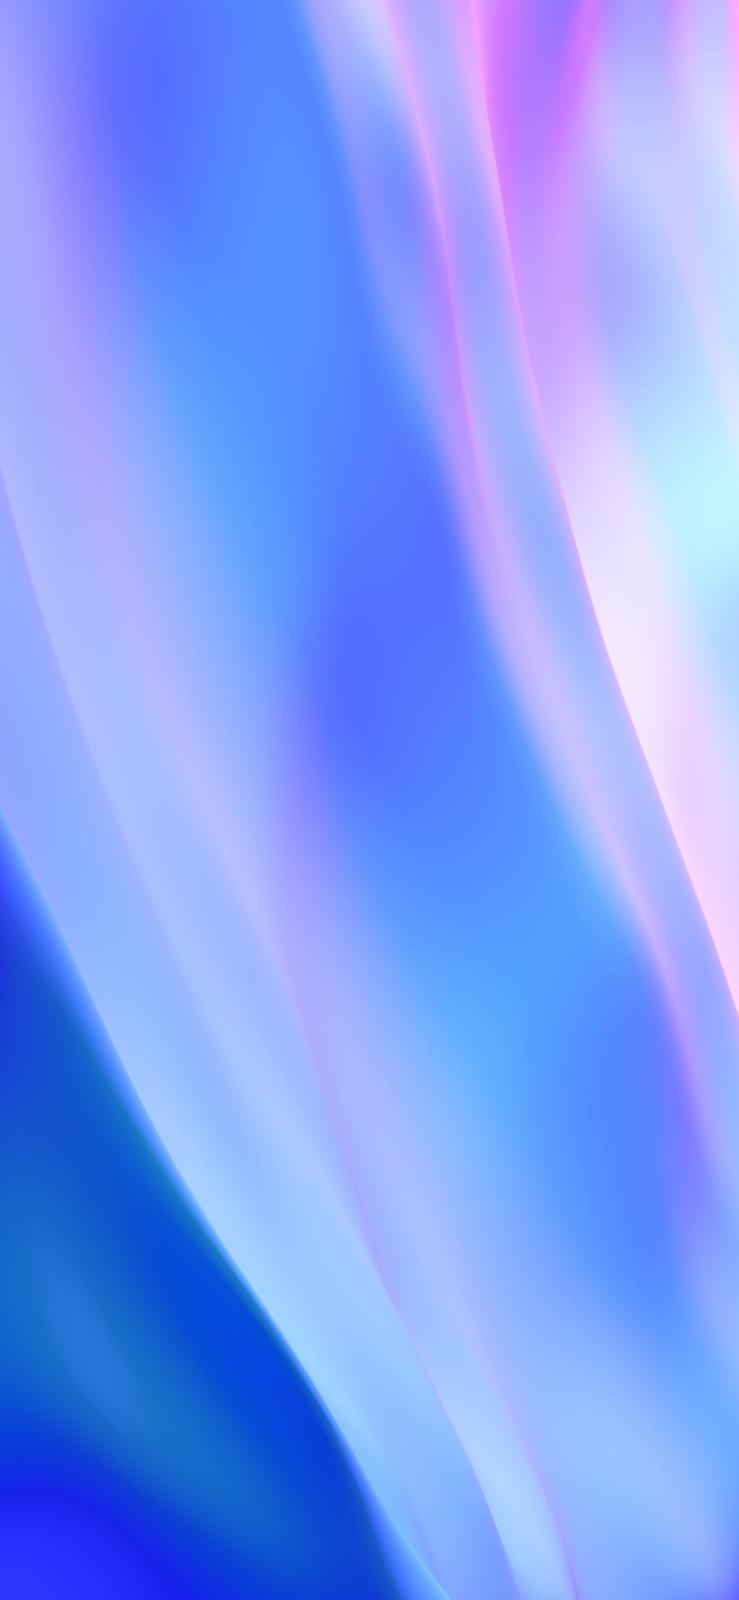 iPhone X 高解析度幾何幻想桌布下載 | 愛瘋日報: 最精準的蘋果媒體